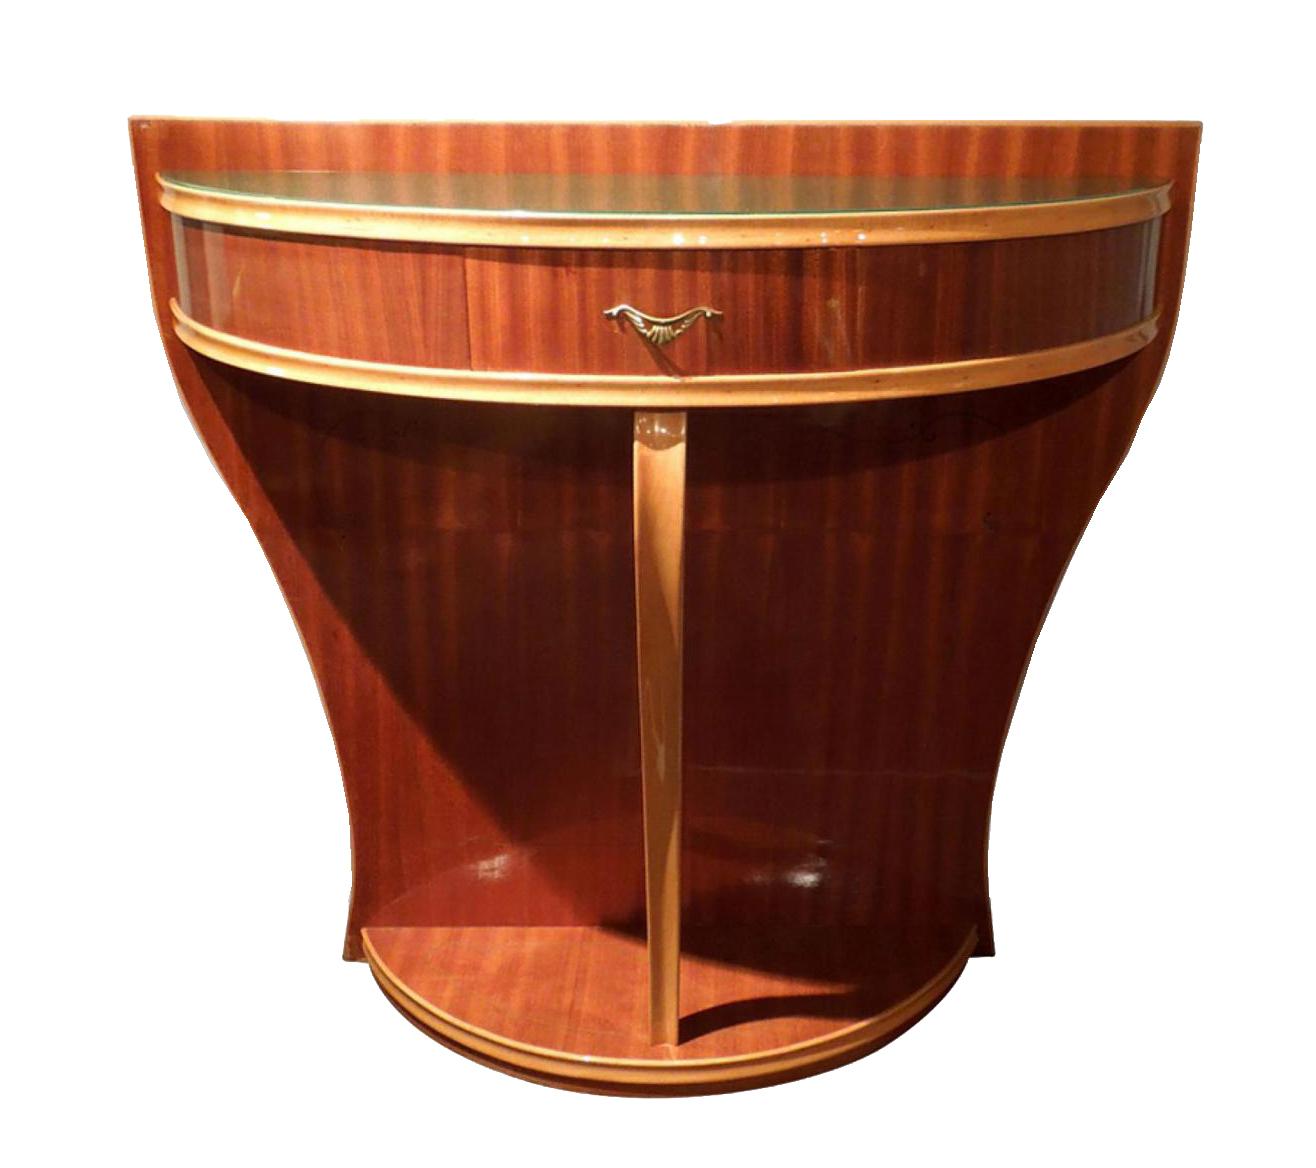 deco console table modernism. Black Bedroom Furniture Sets. Home Design Ideas